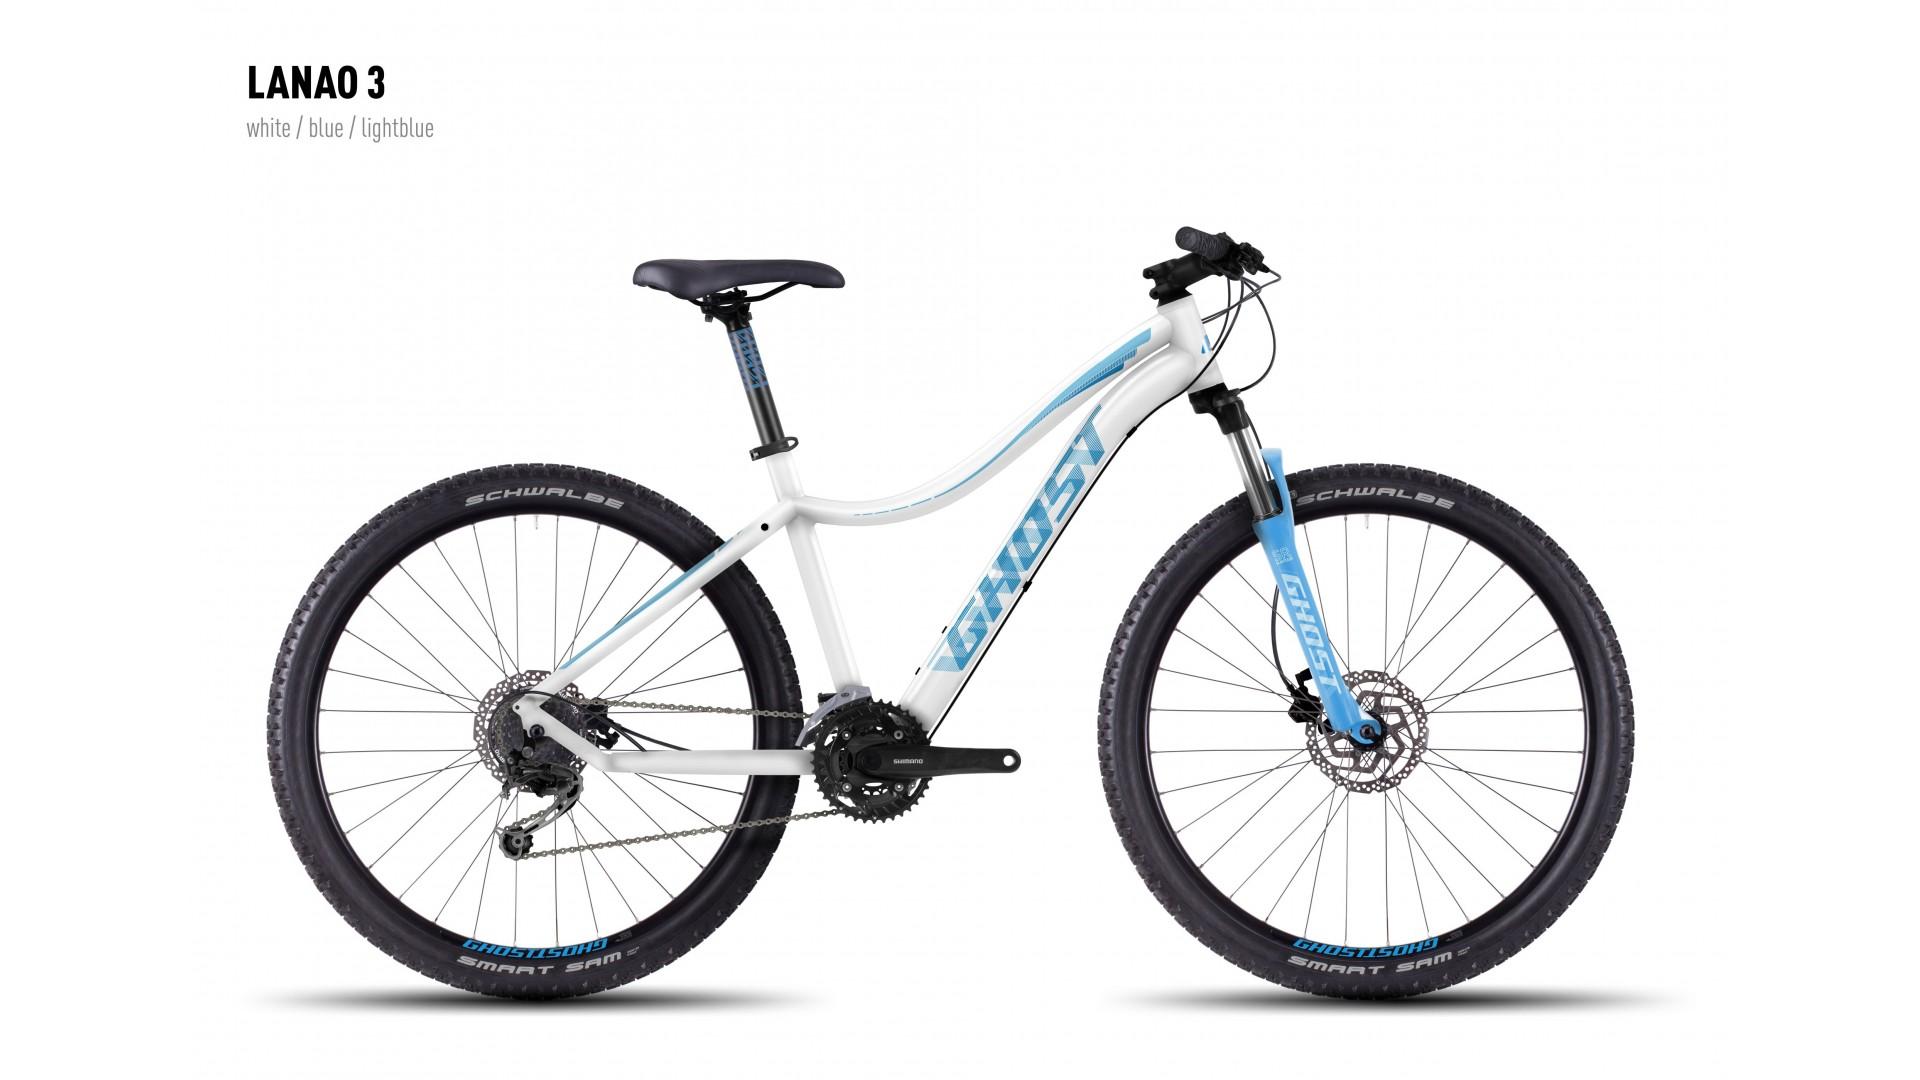 Велосипед GHOST Lanao 3 white/blue/lightblue год 2016